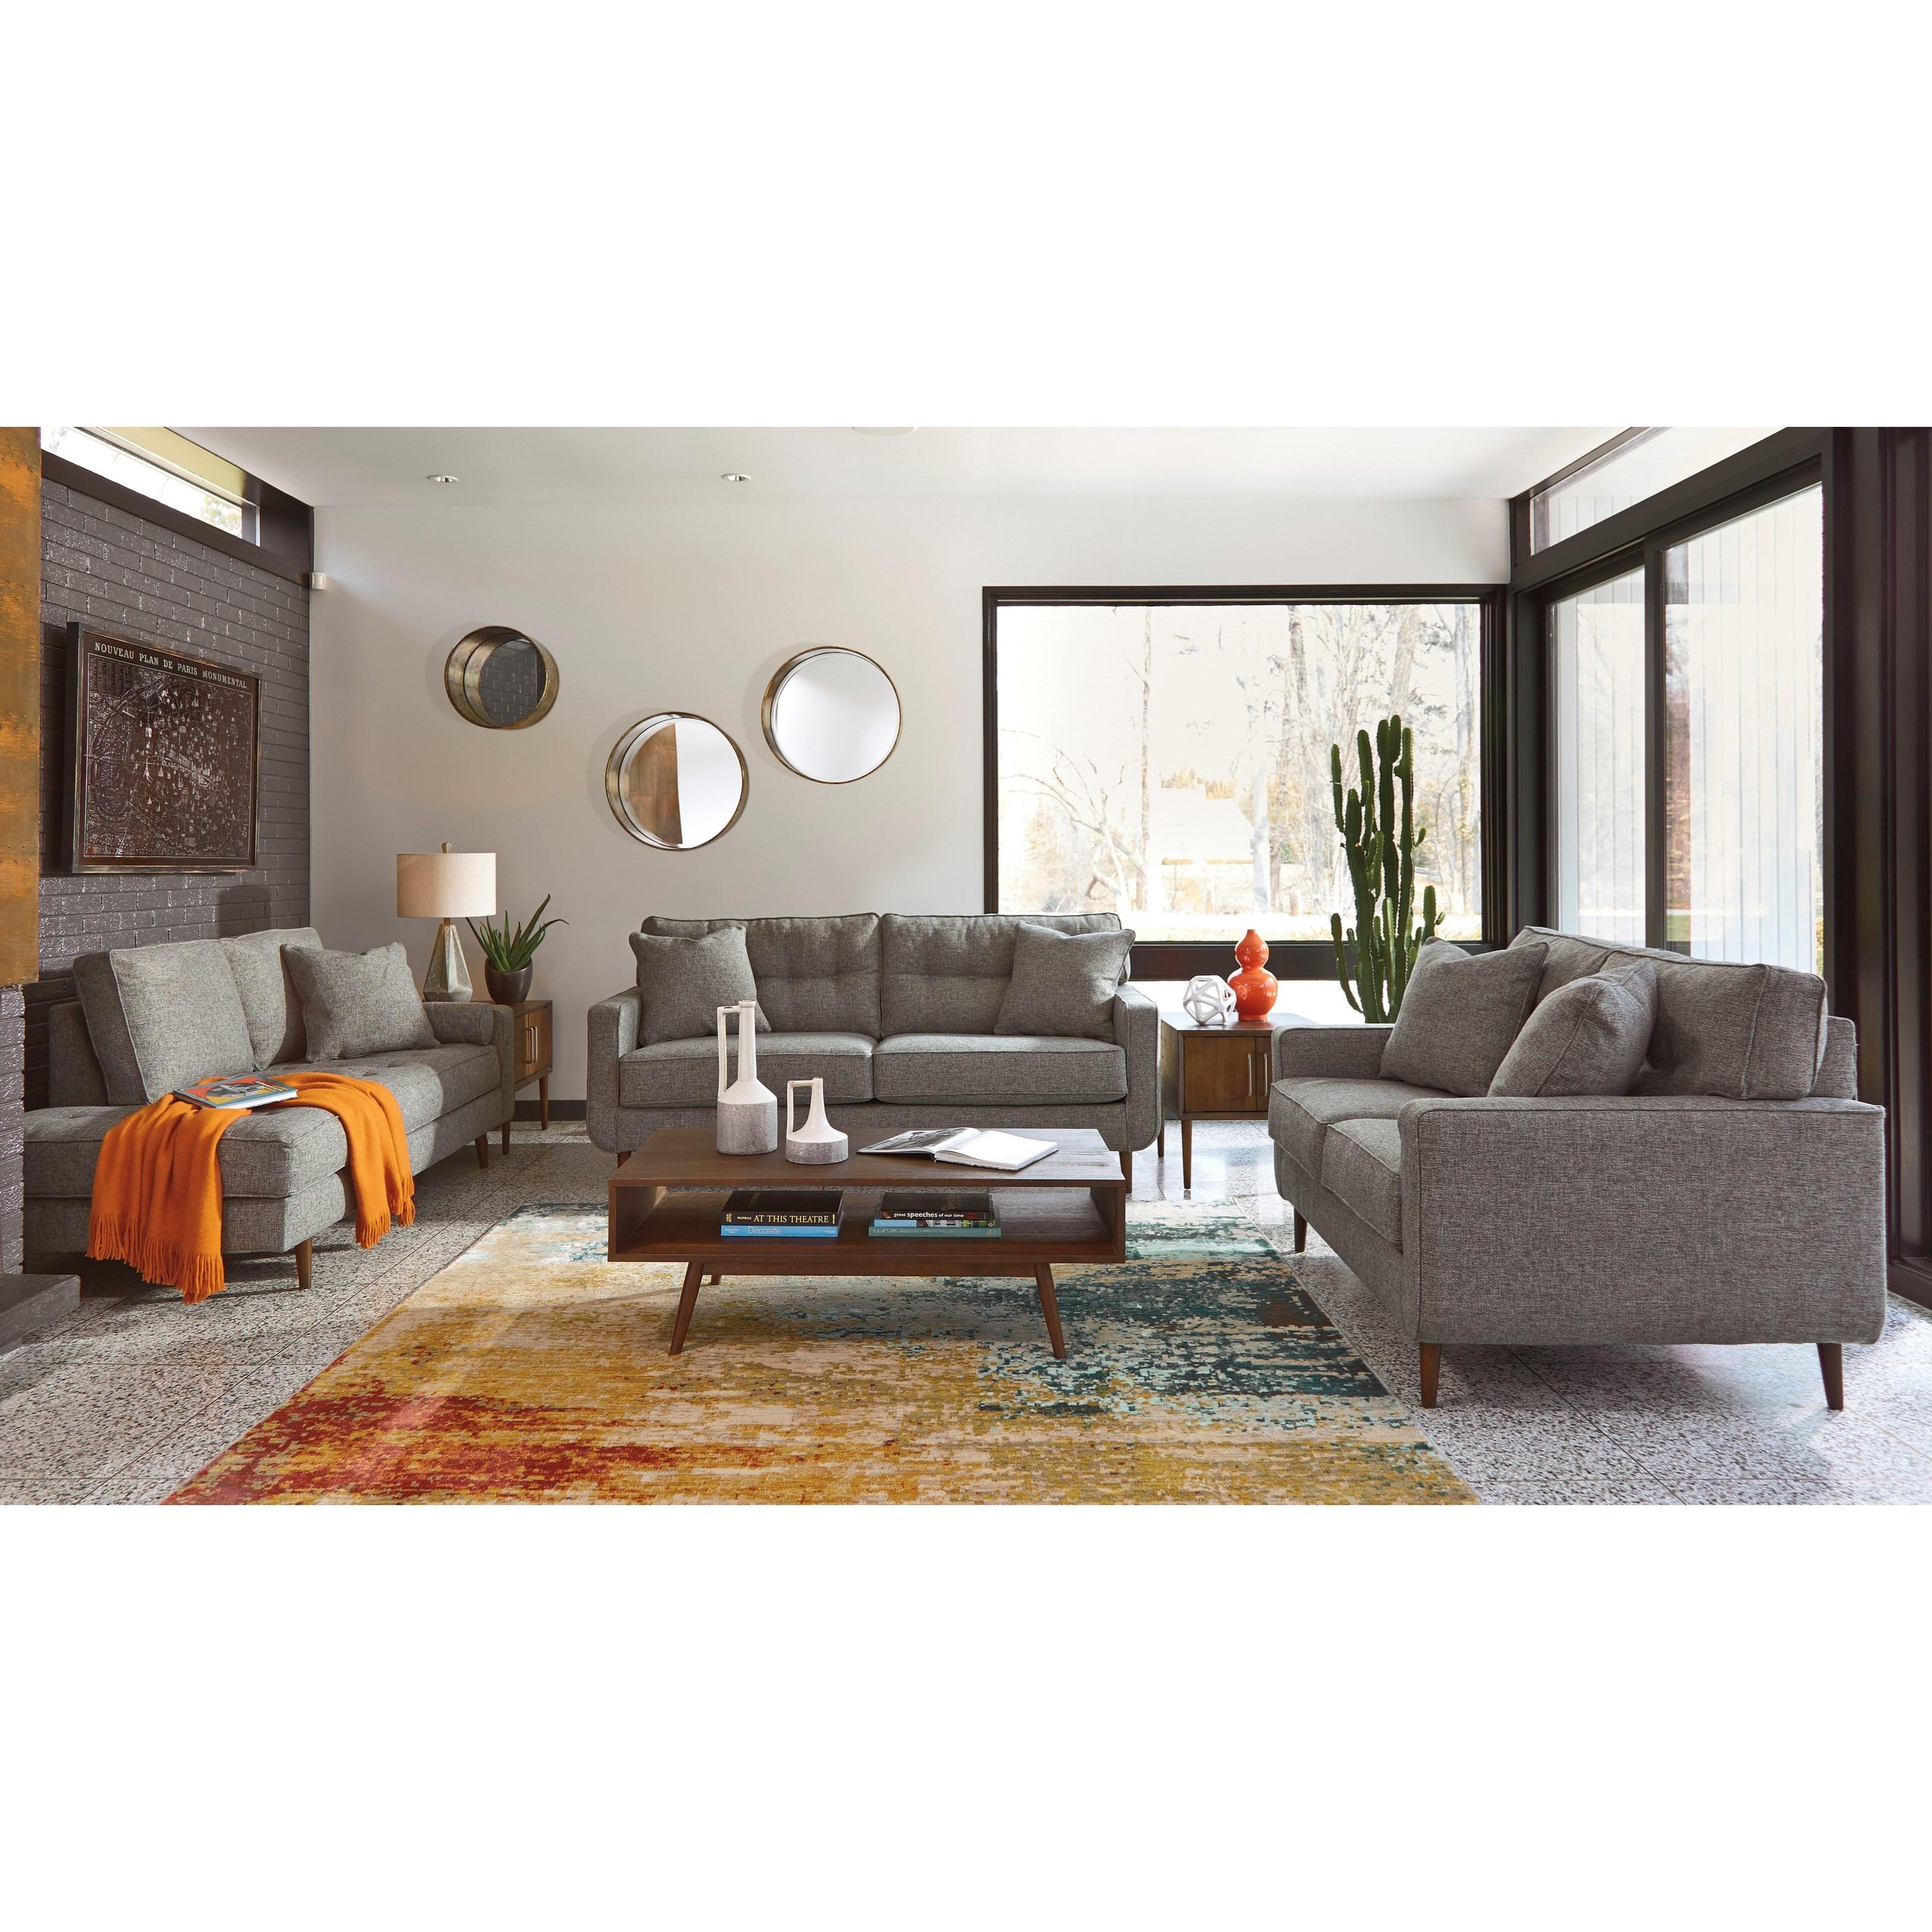 Ashley Furniture Zardoni Stationary Living Room Group